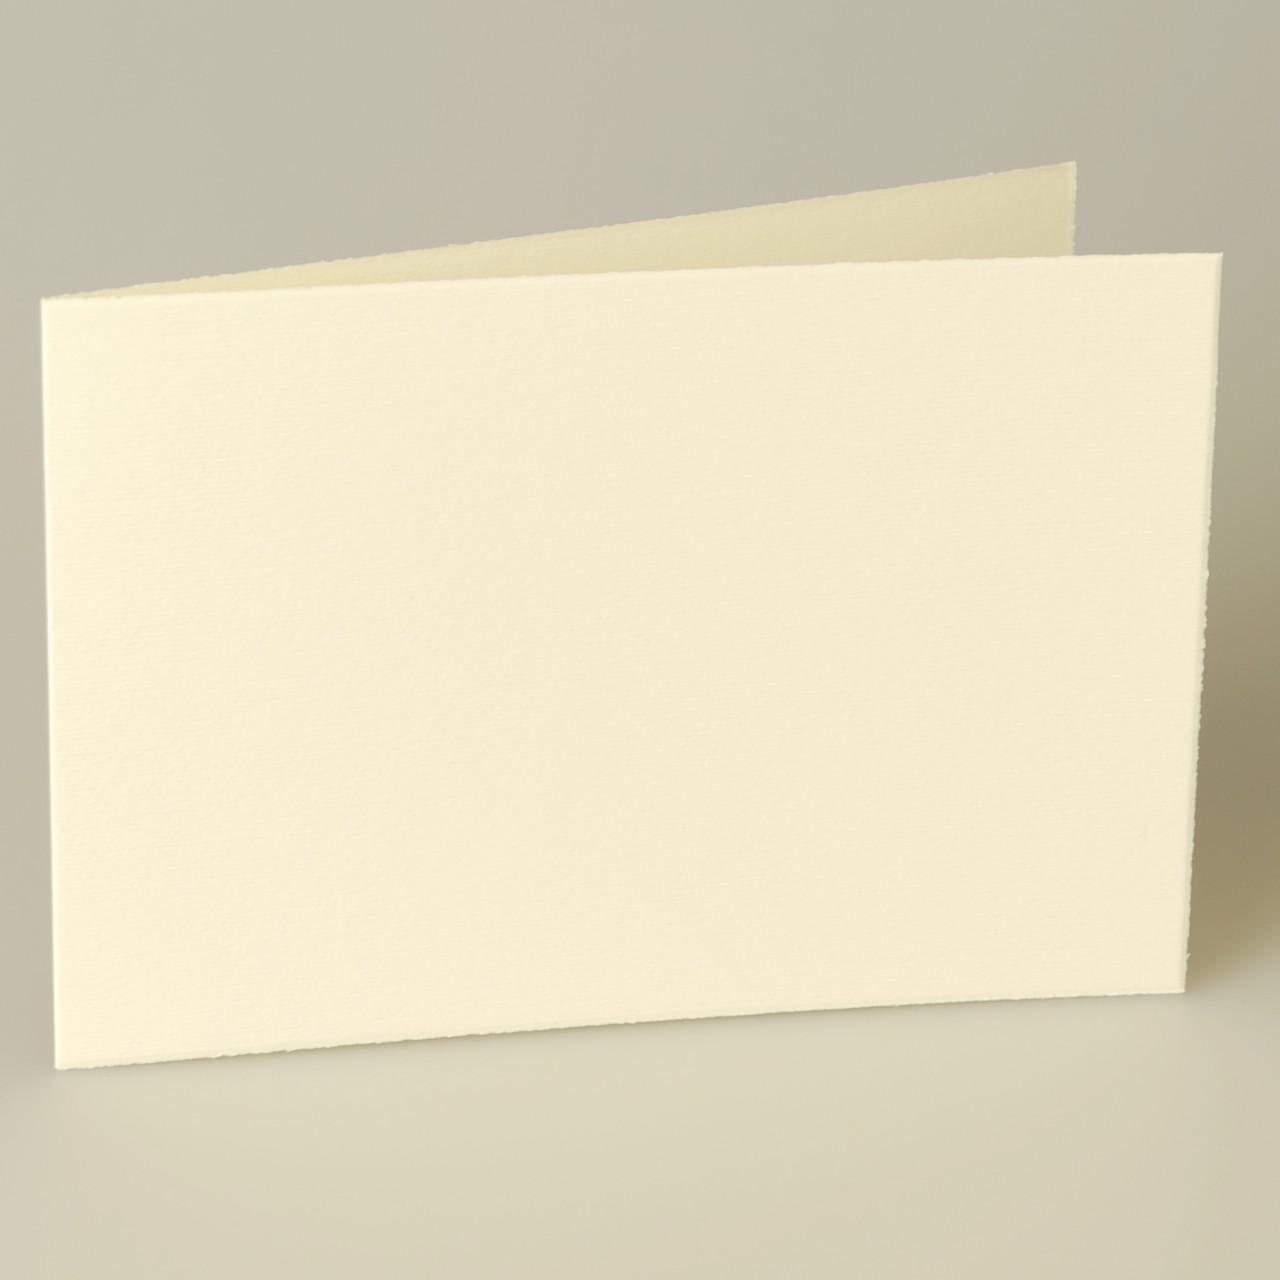 Blancokarte - B 3789